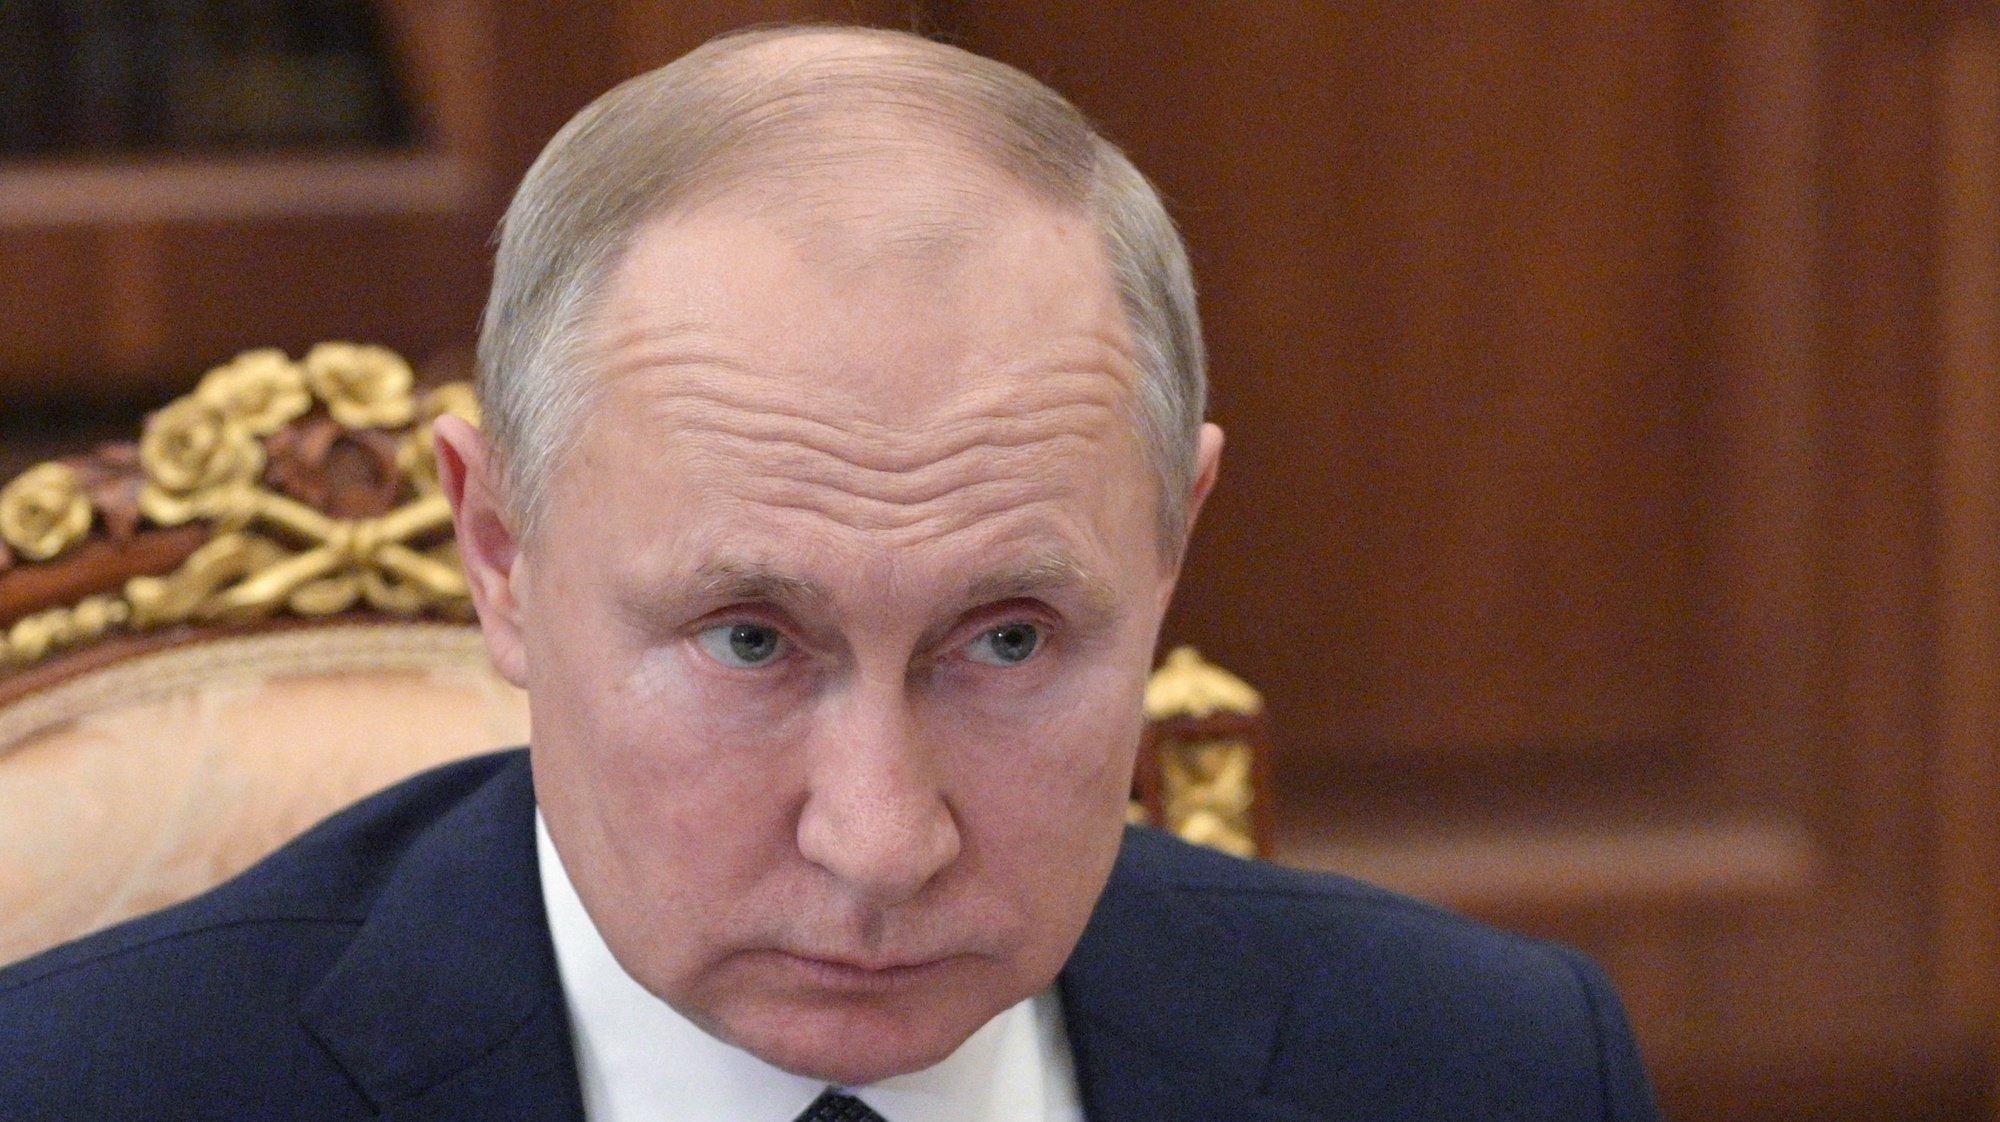 epa09206712 Russian President Vladimir Putin attends a working meeting  at the Kremlin in Moscow, Russia, 17 May 2021.  EPA/ALEXEI DRUZHININ / SPUTNIK / KREMLIN POOL MANDATORY CREDIT